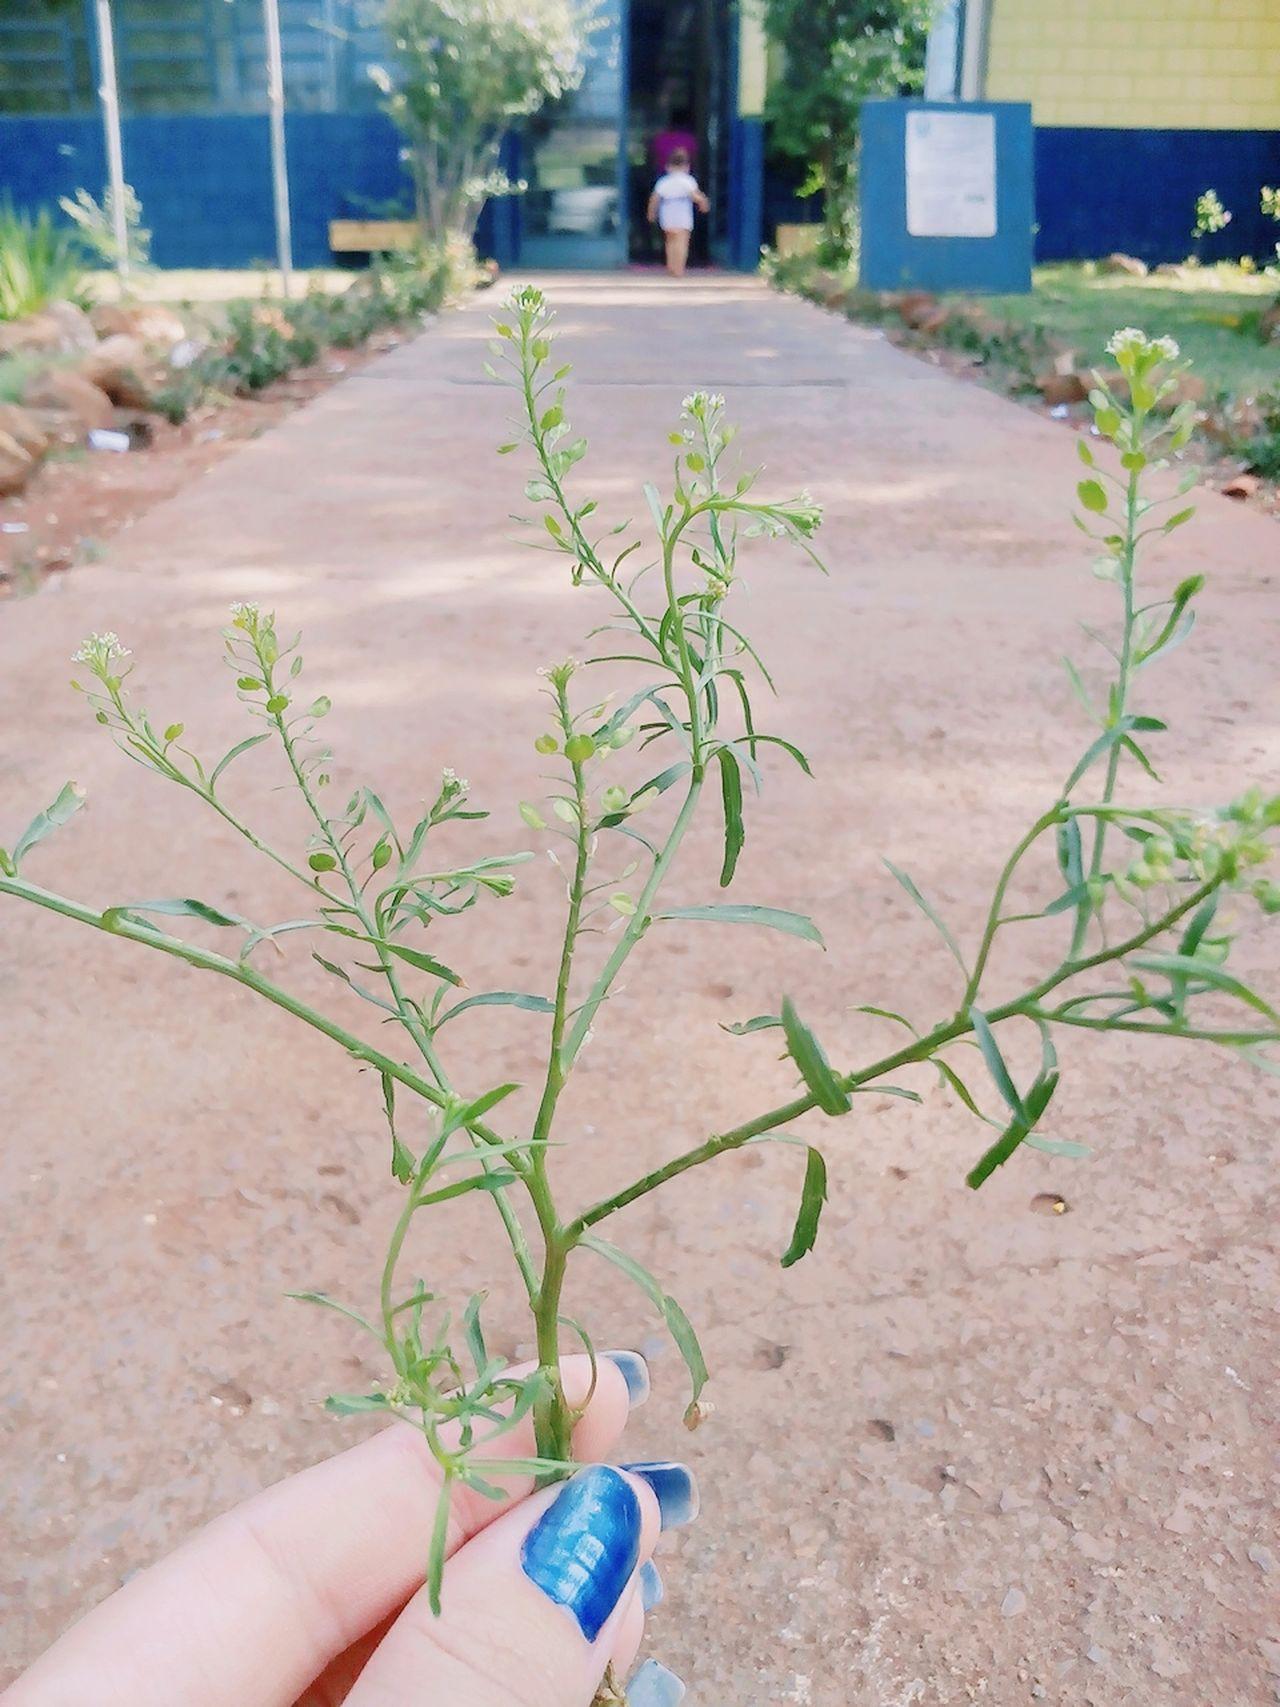 Folha Leaf Tree Arvore Mao Hand Criança Chrildren School Escola